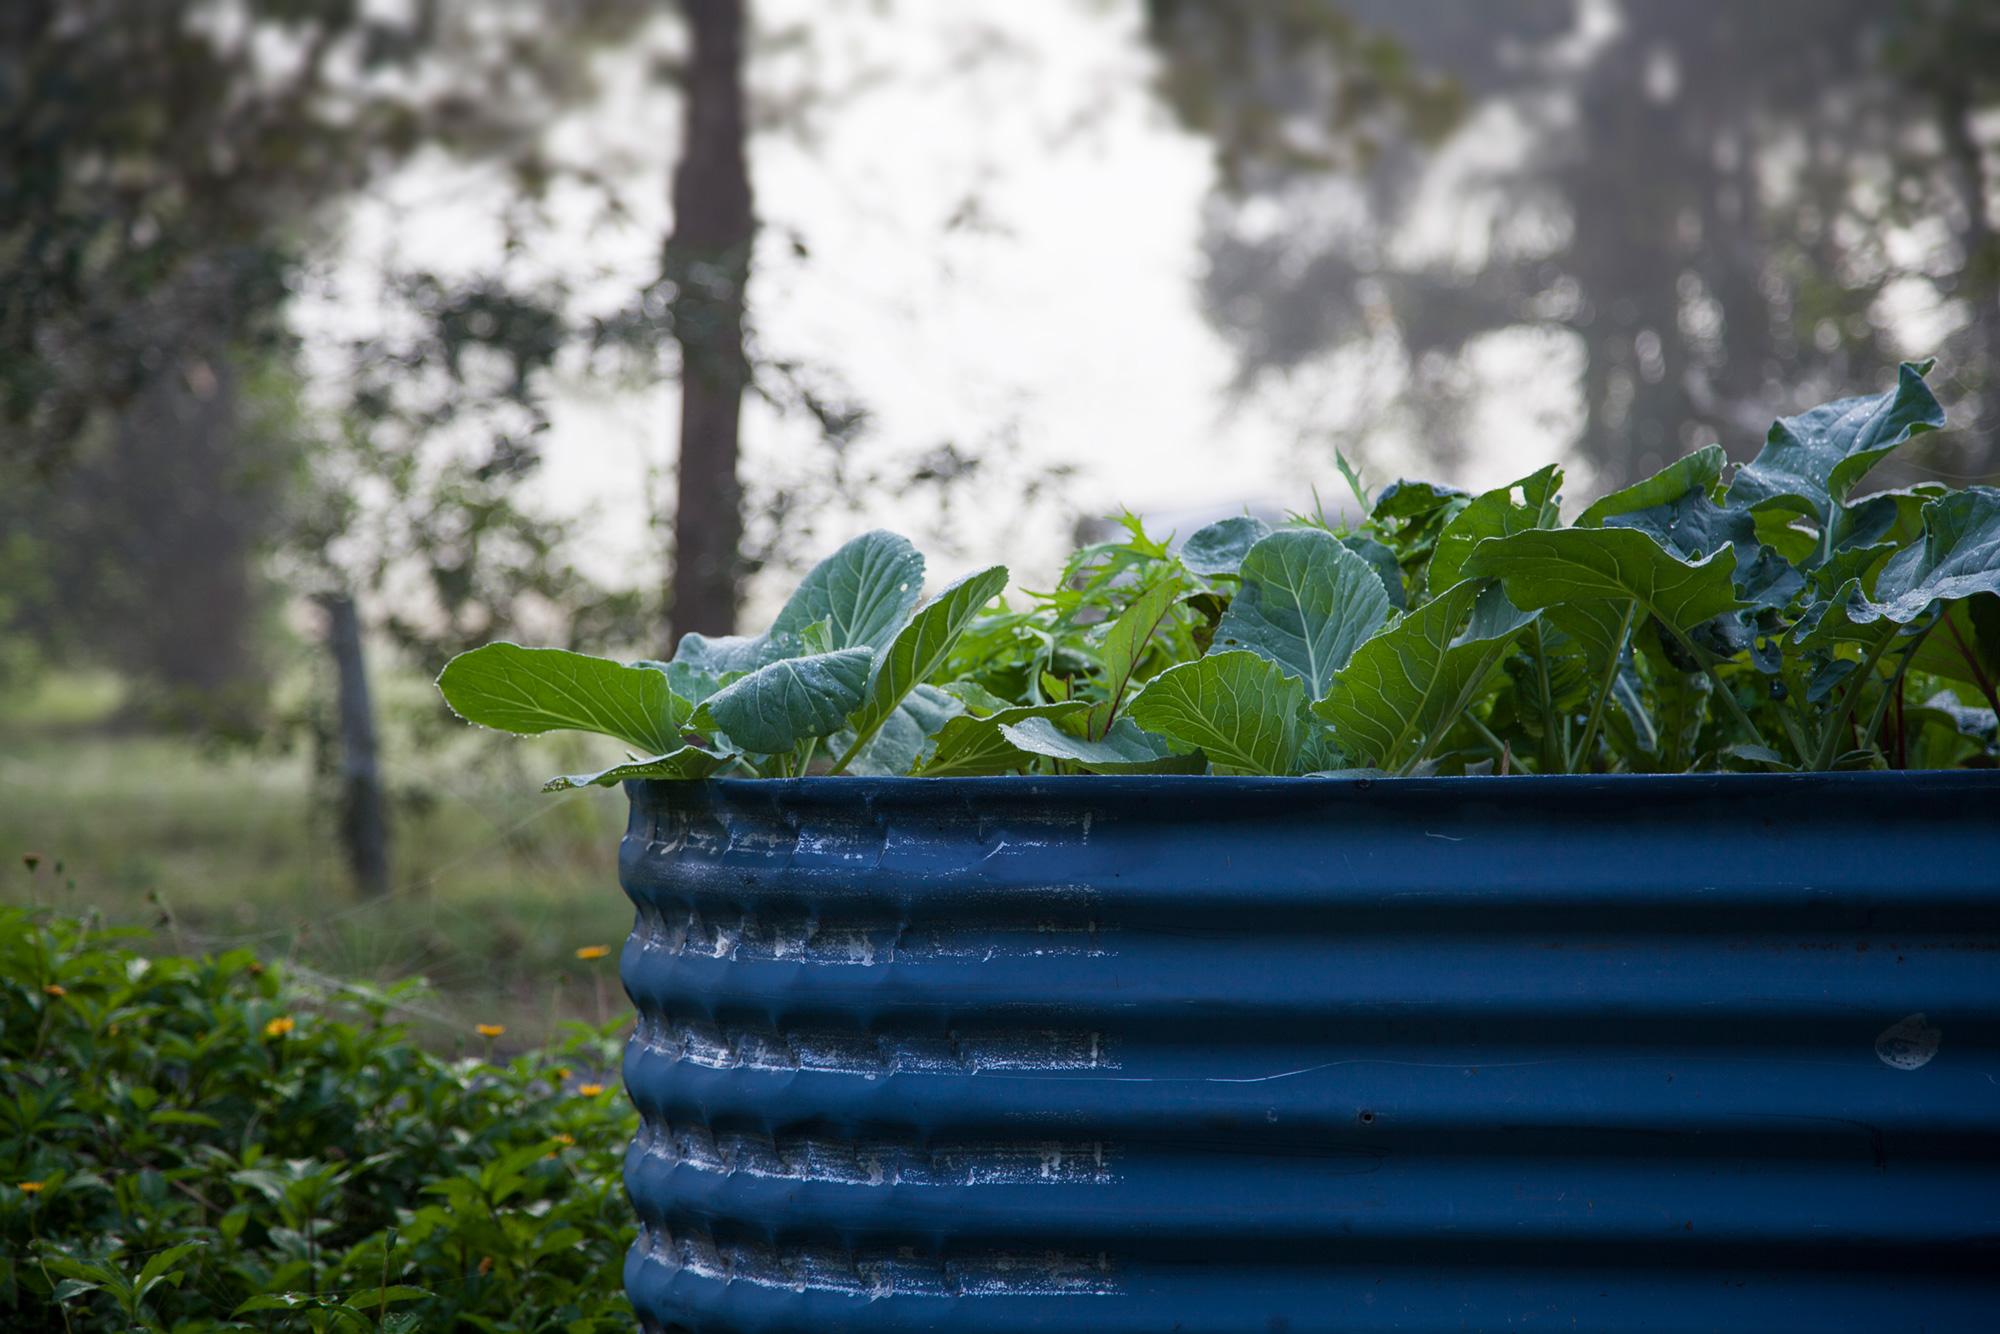 Organic recycled garden installations